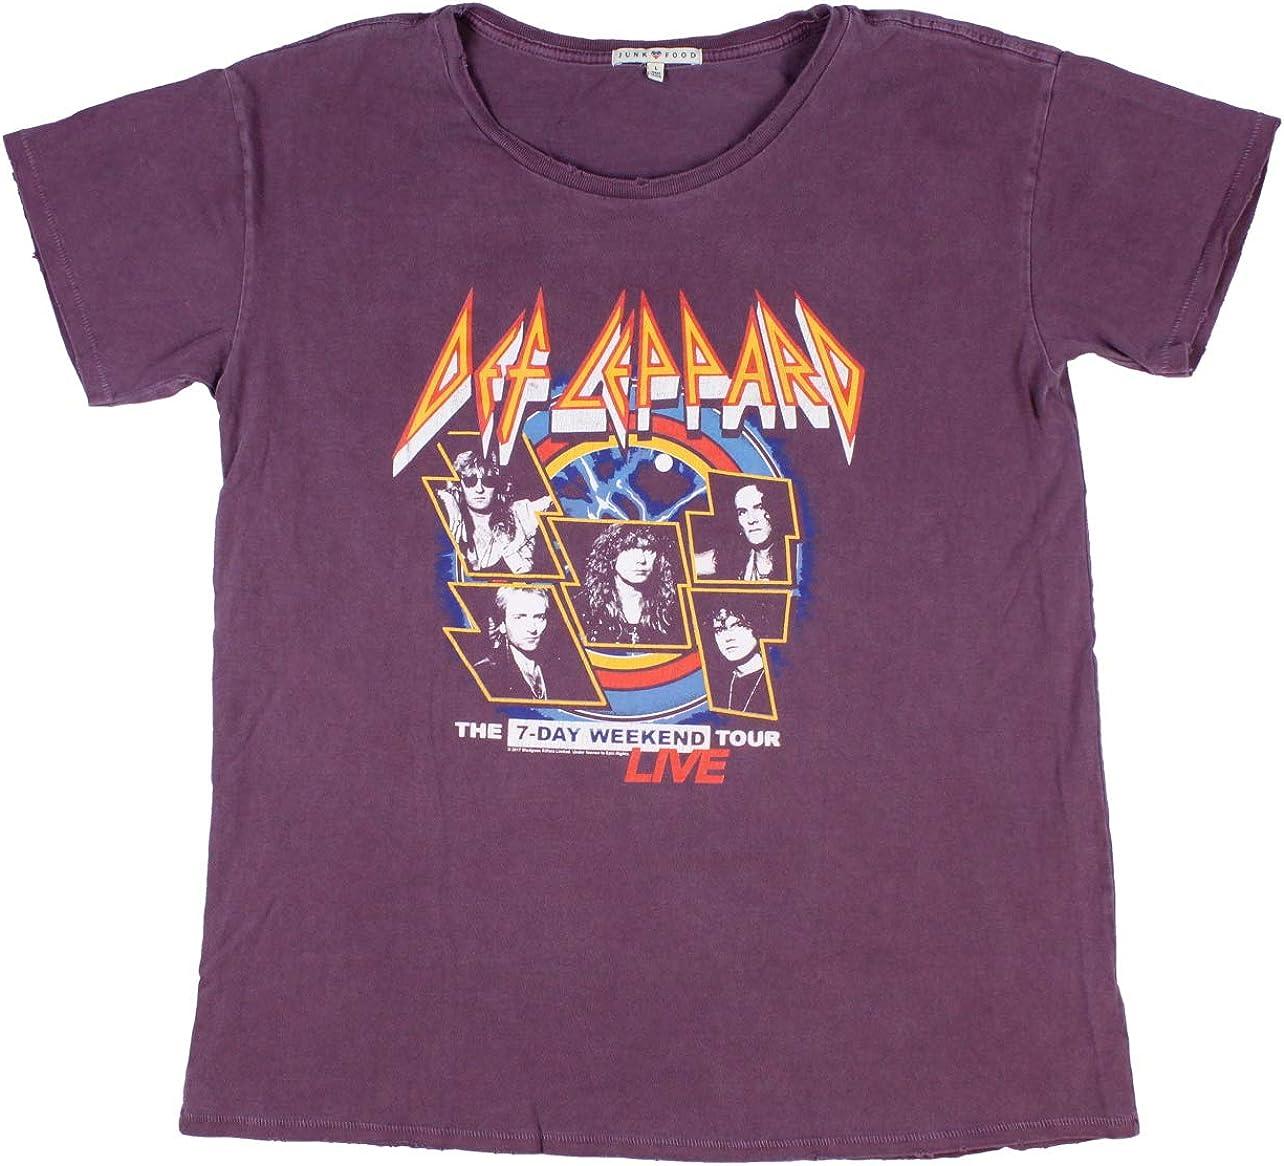 Junk Food Women's Def Leppard Vintage 7-Day Weekend Tour Band T-Shirt